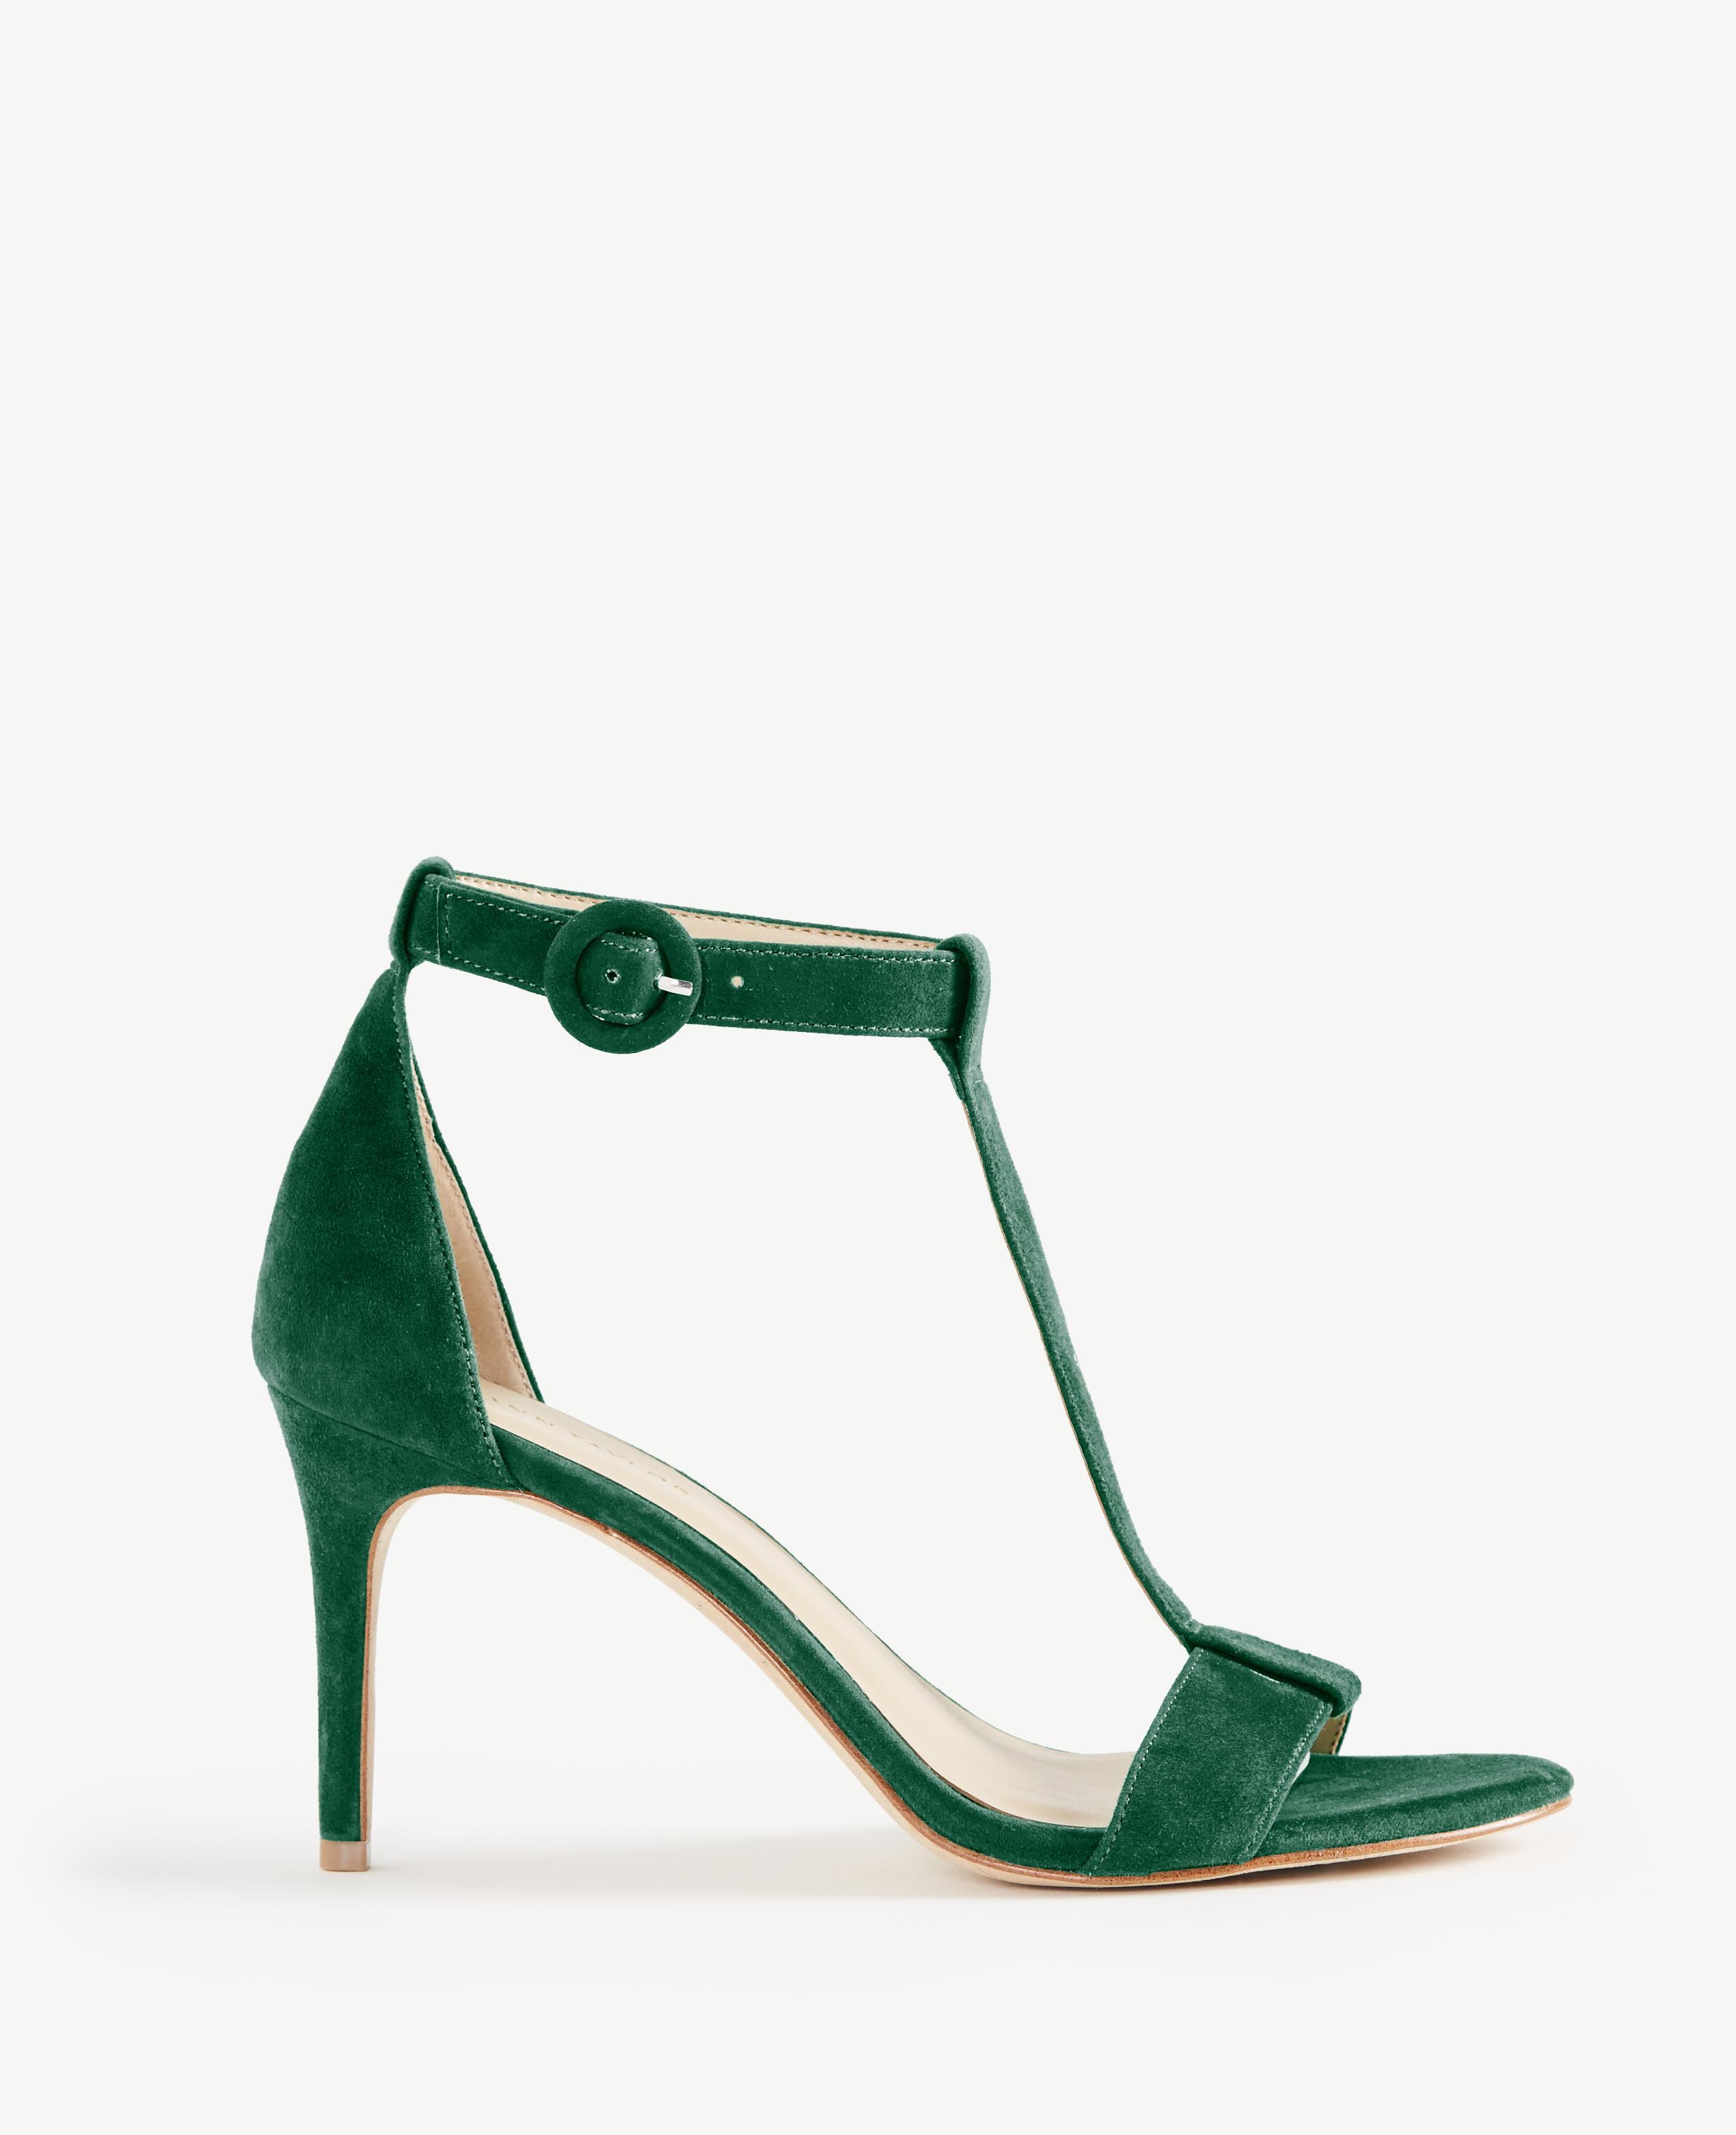 c9dba604df99 Lyst - Ann Taylor Demi Suede T-strap Sandals in Green